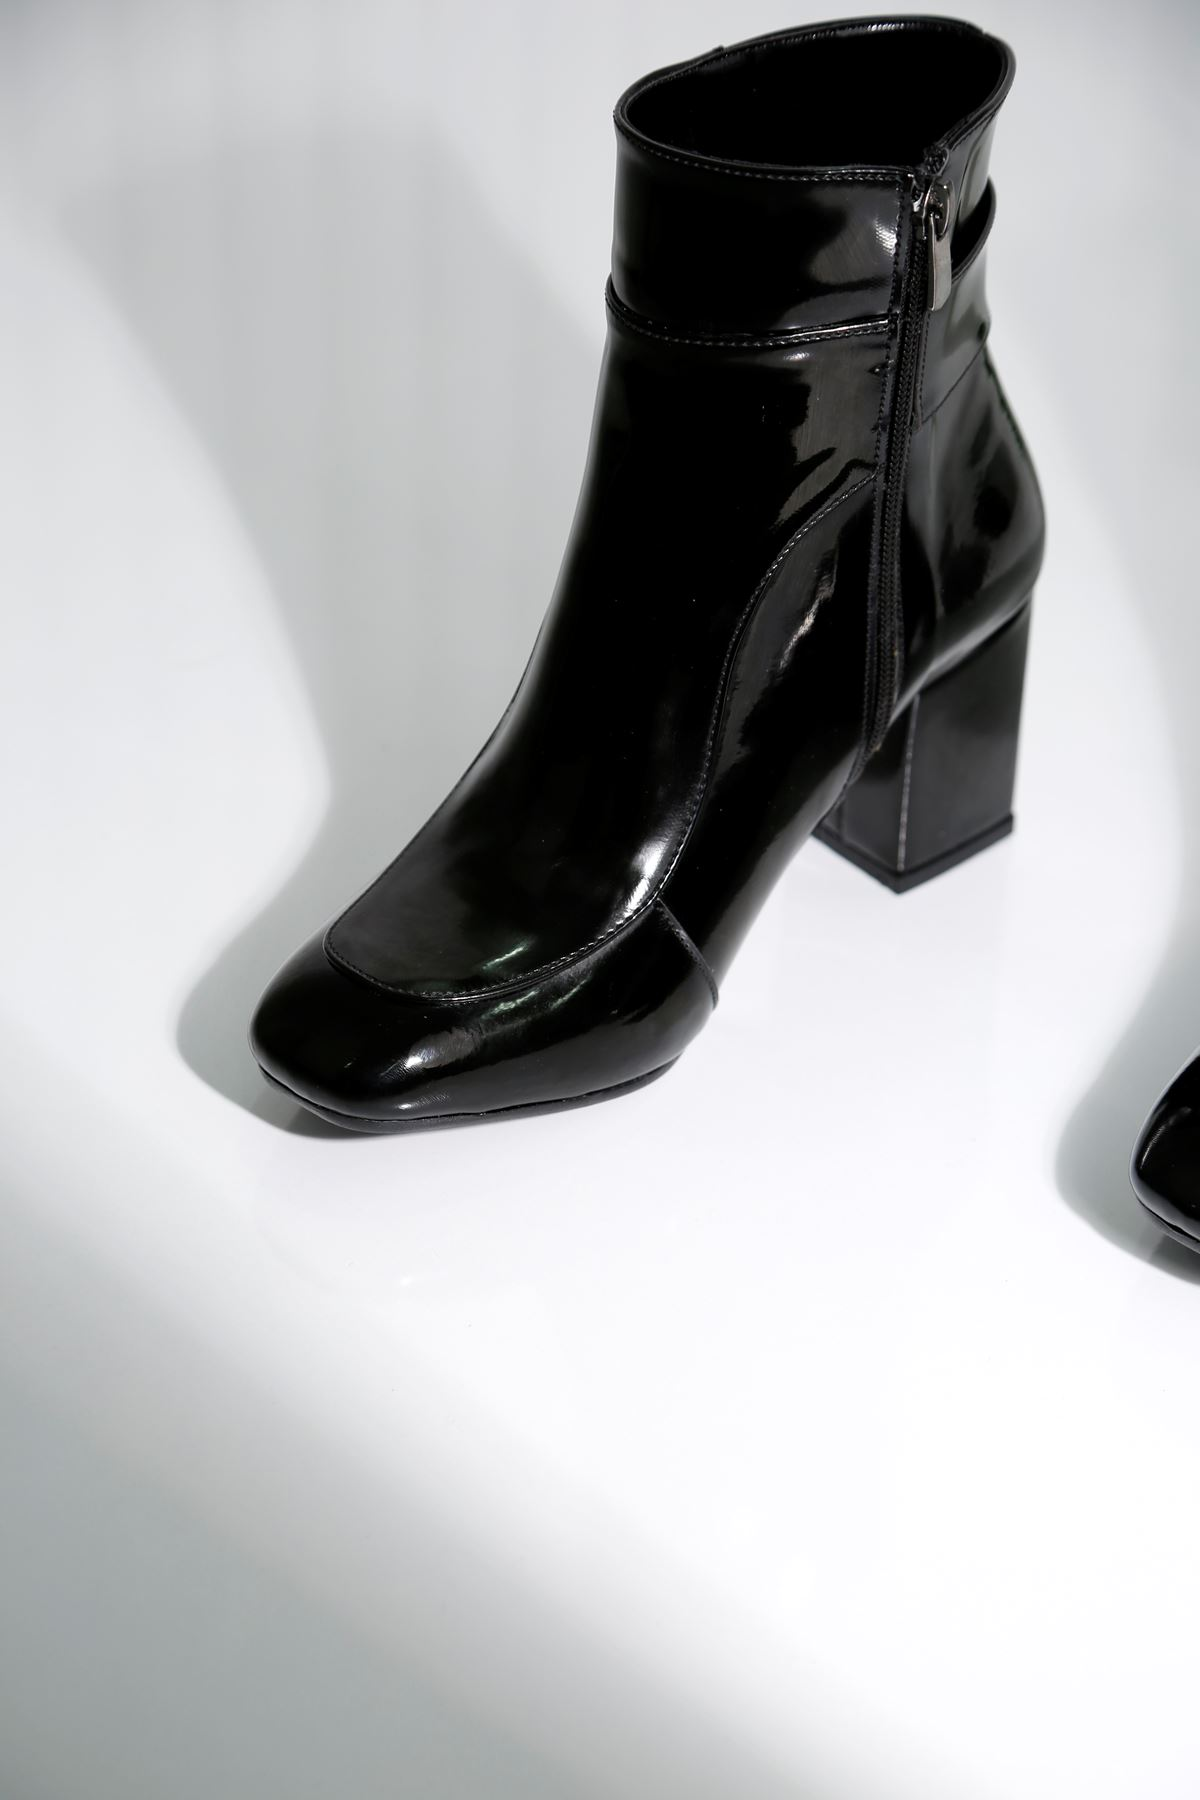 FREDDO Siyah Rugan Kadın Bot